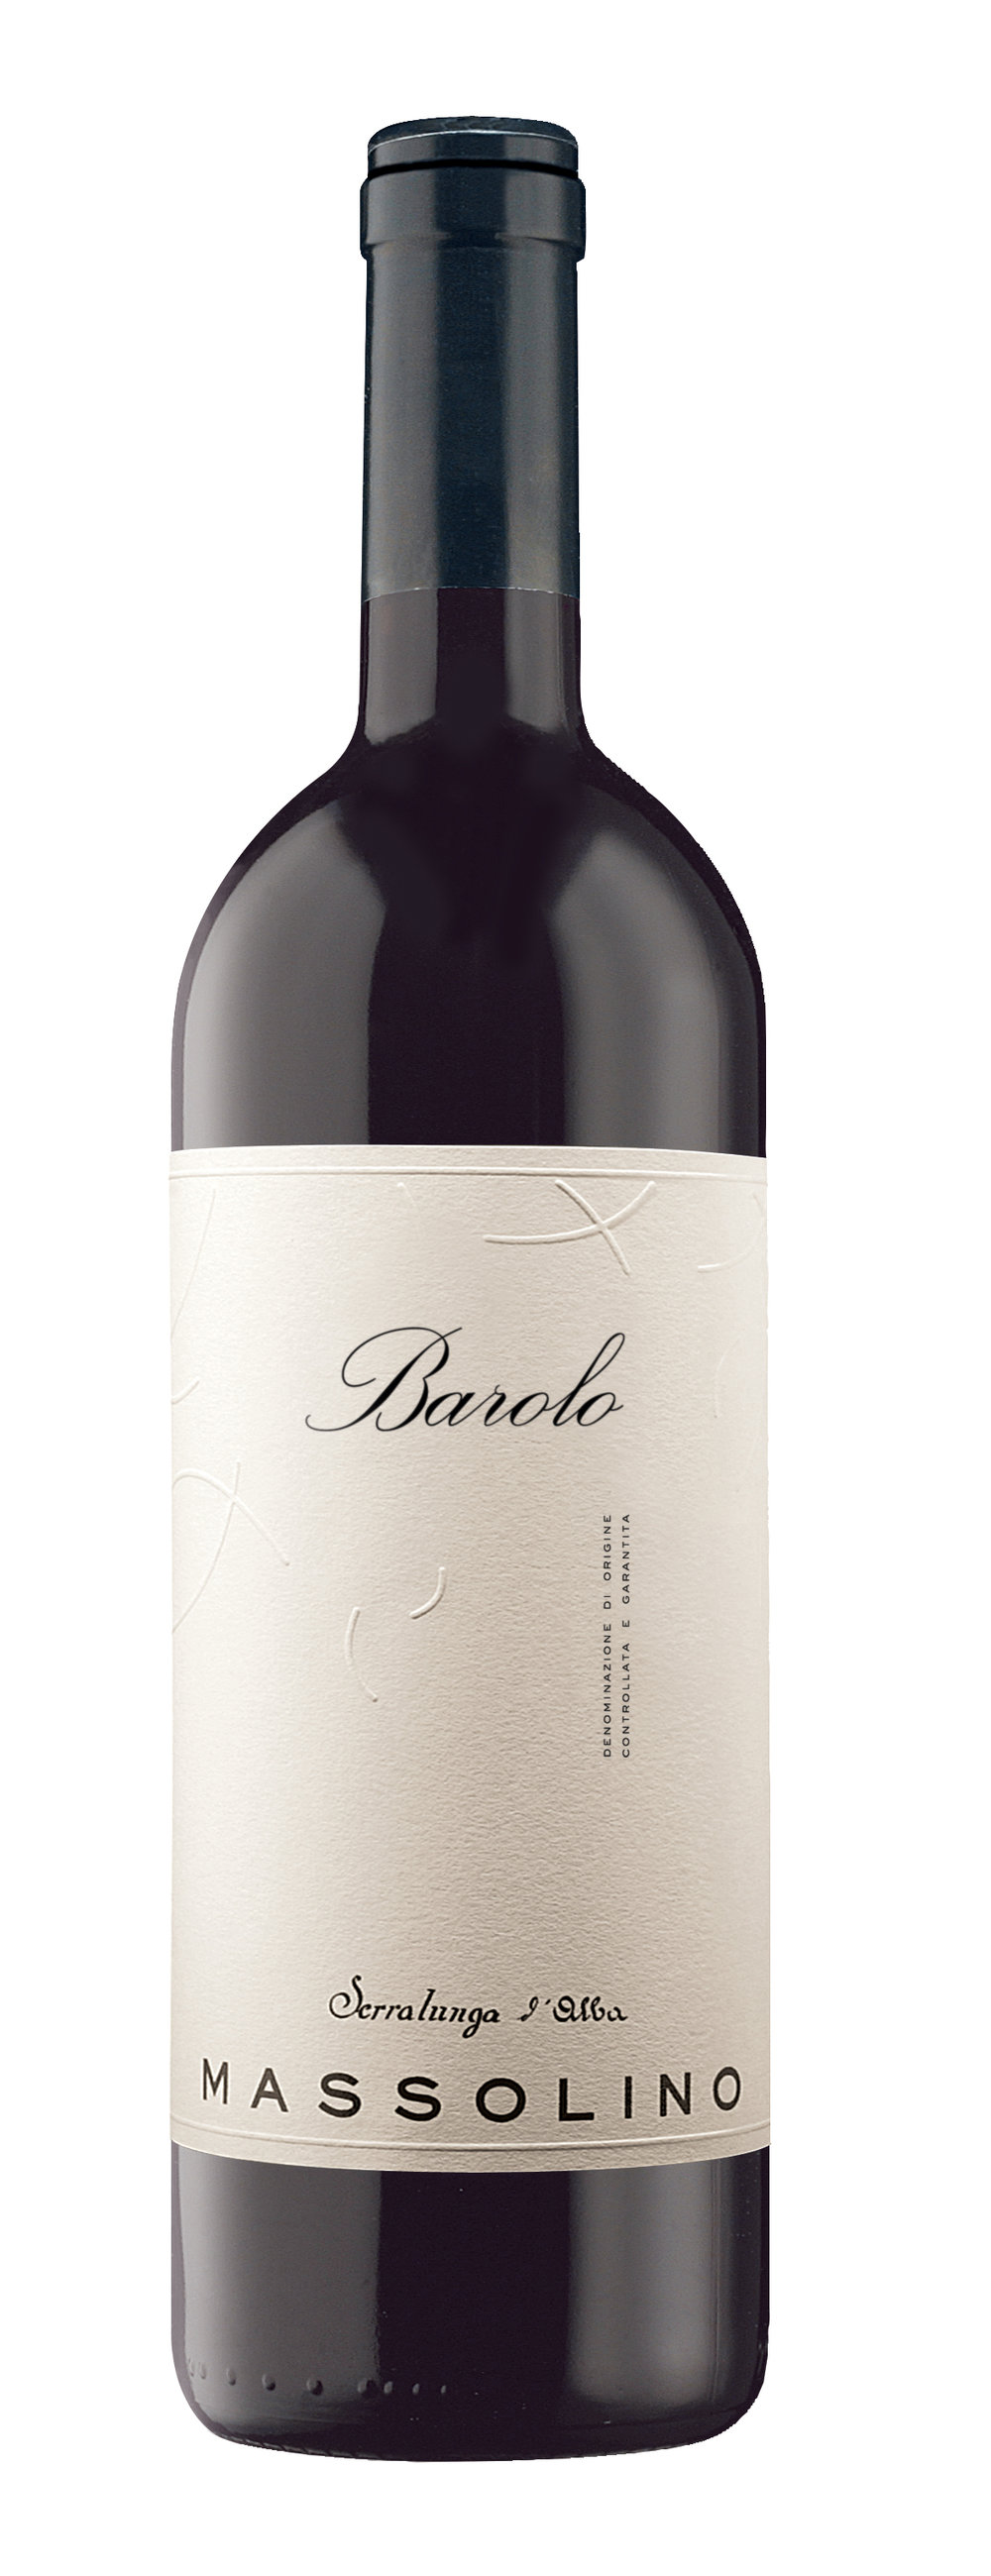 Massolino Barolo Bottle.jpg